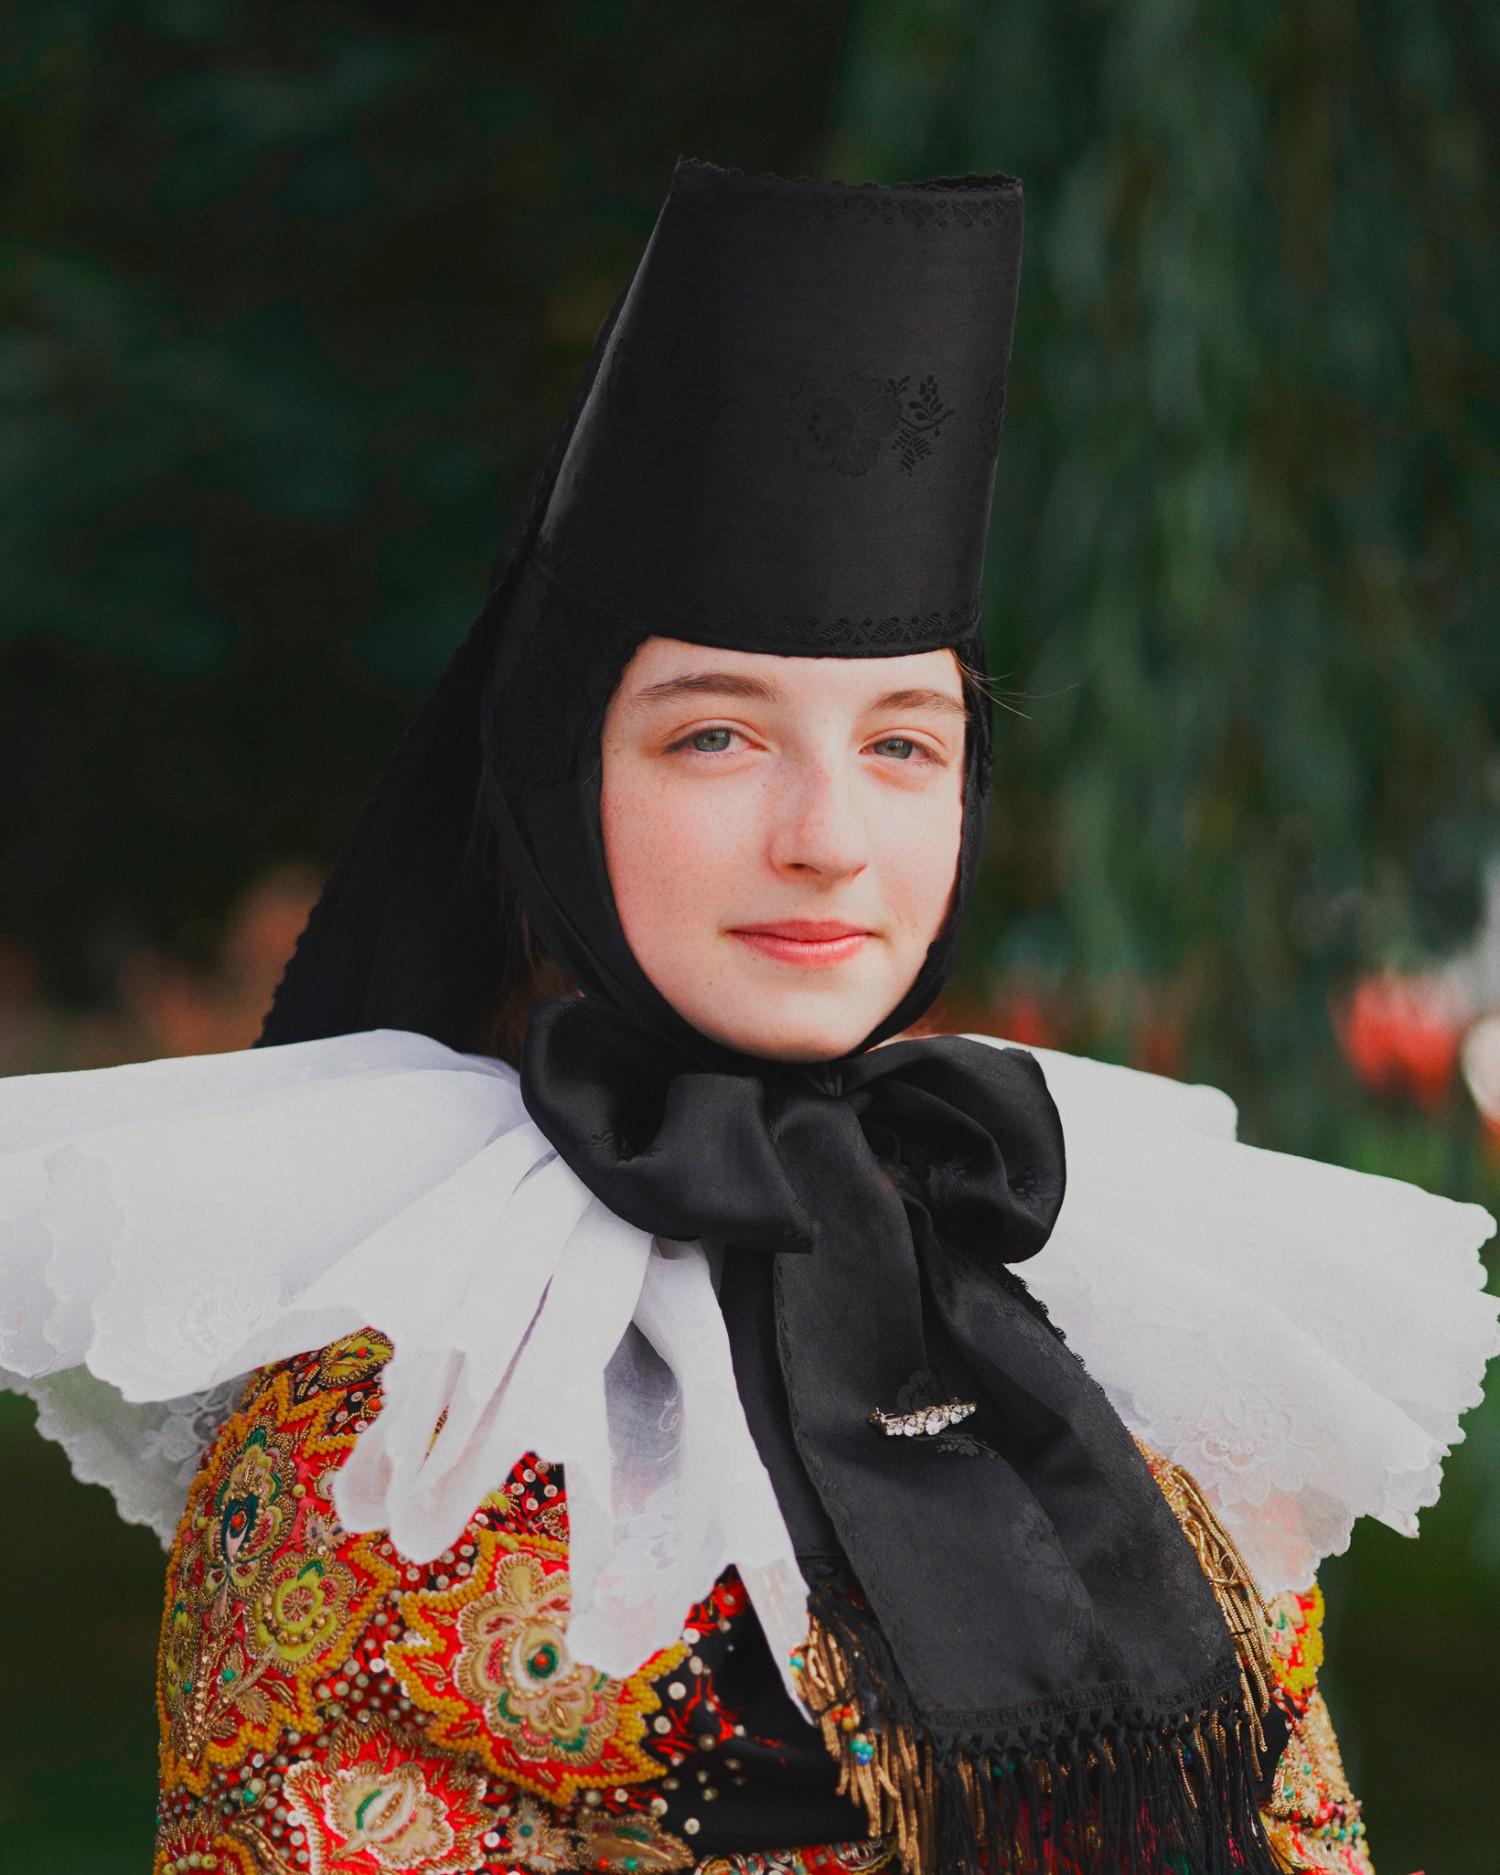 Clara Nebeling